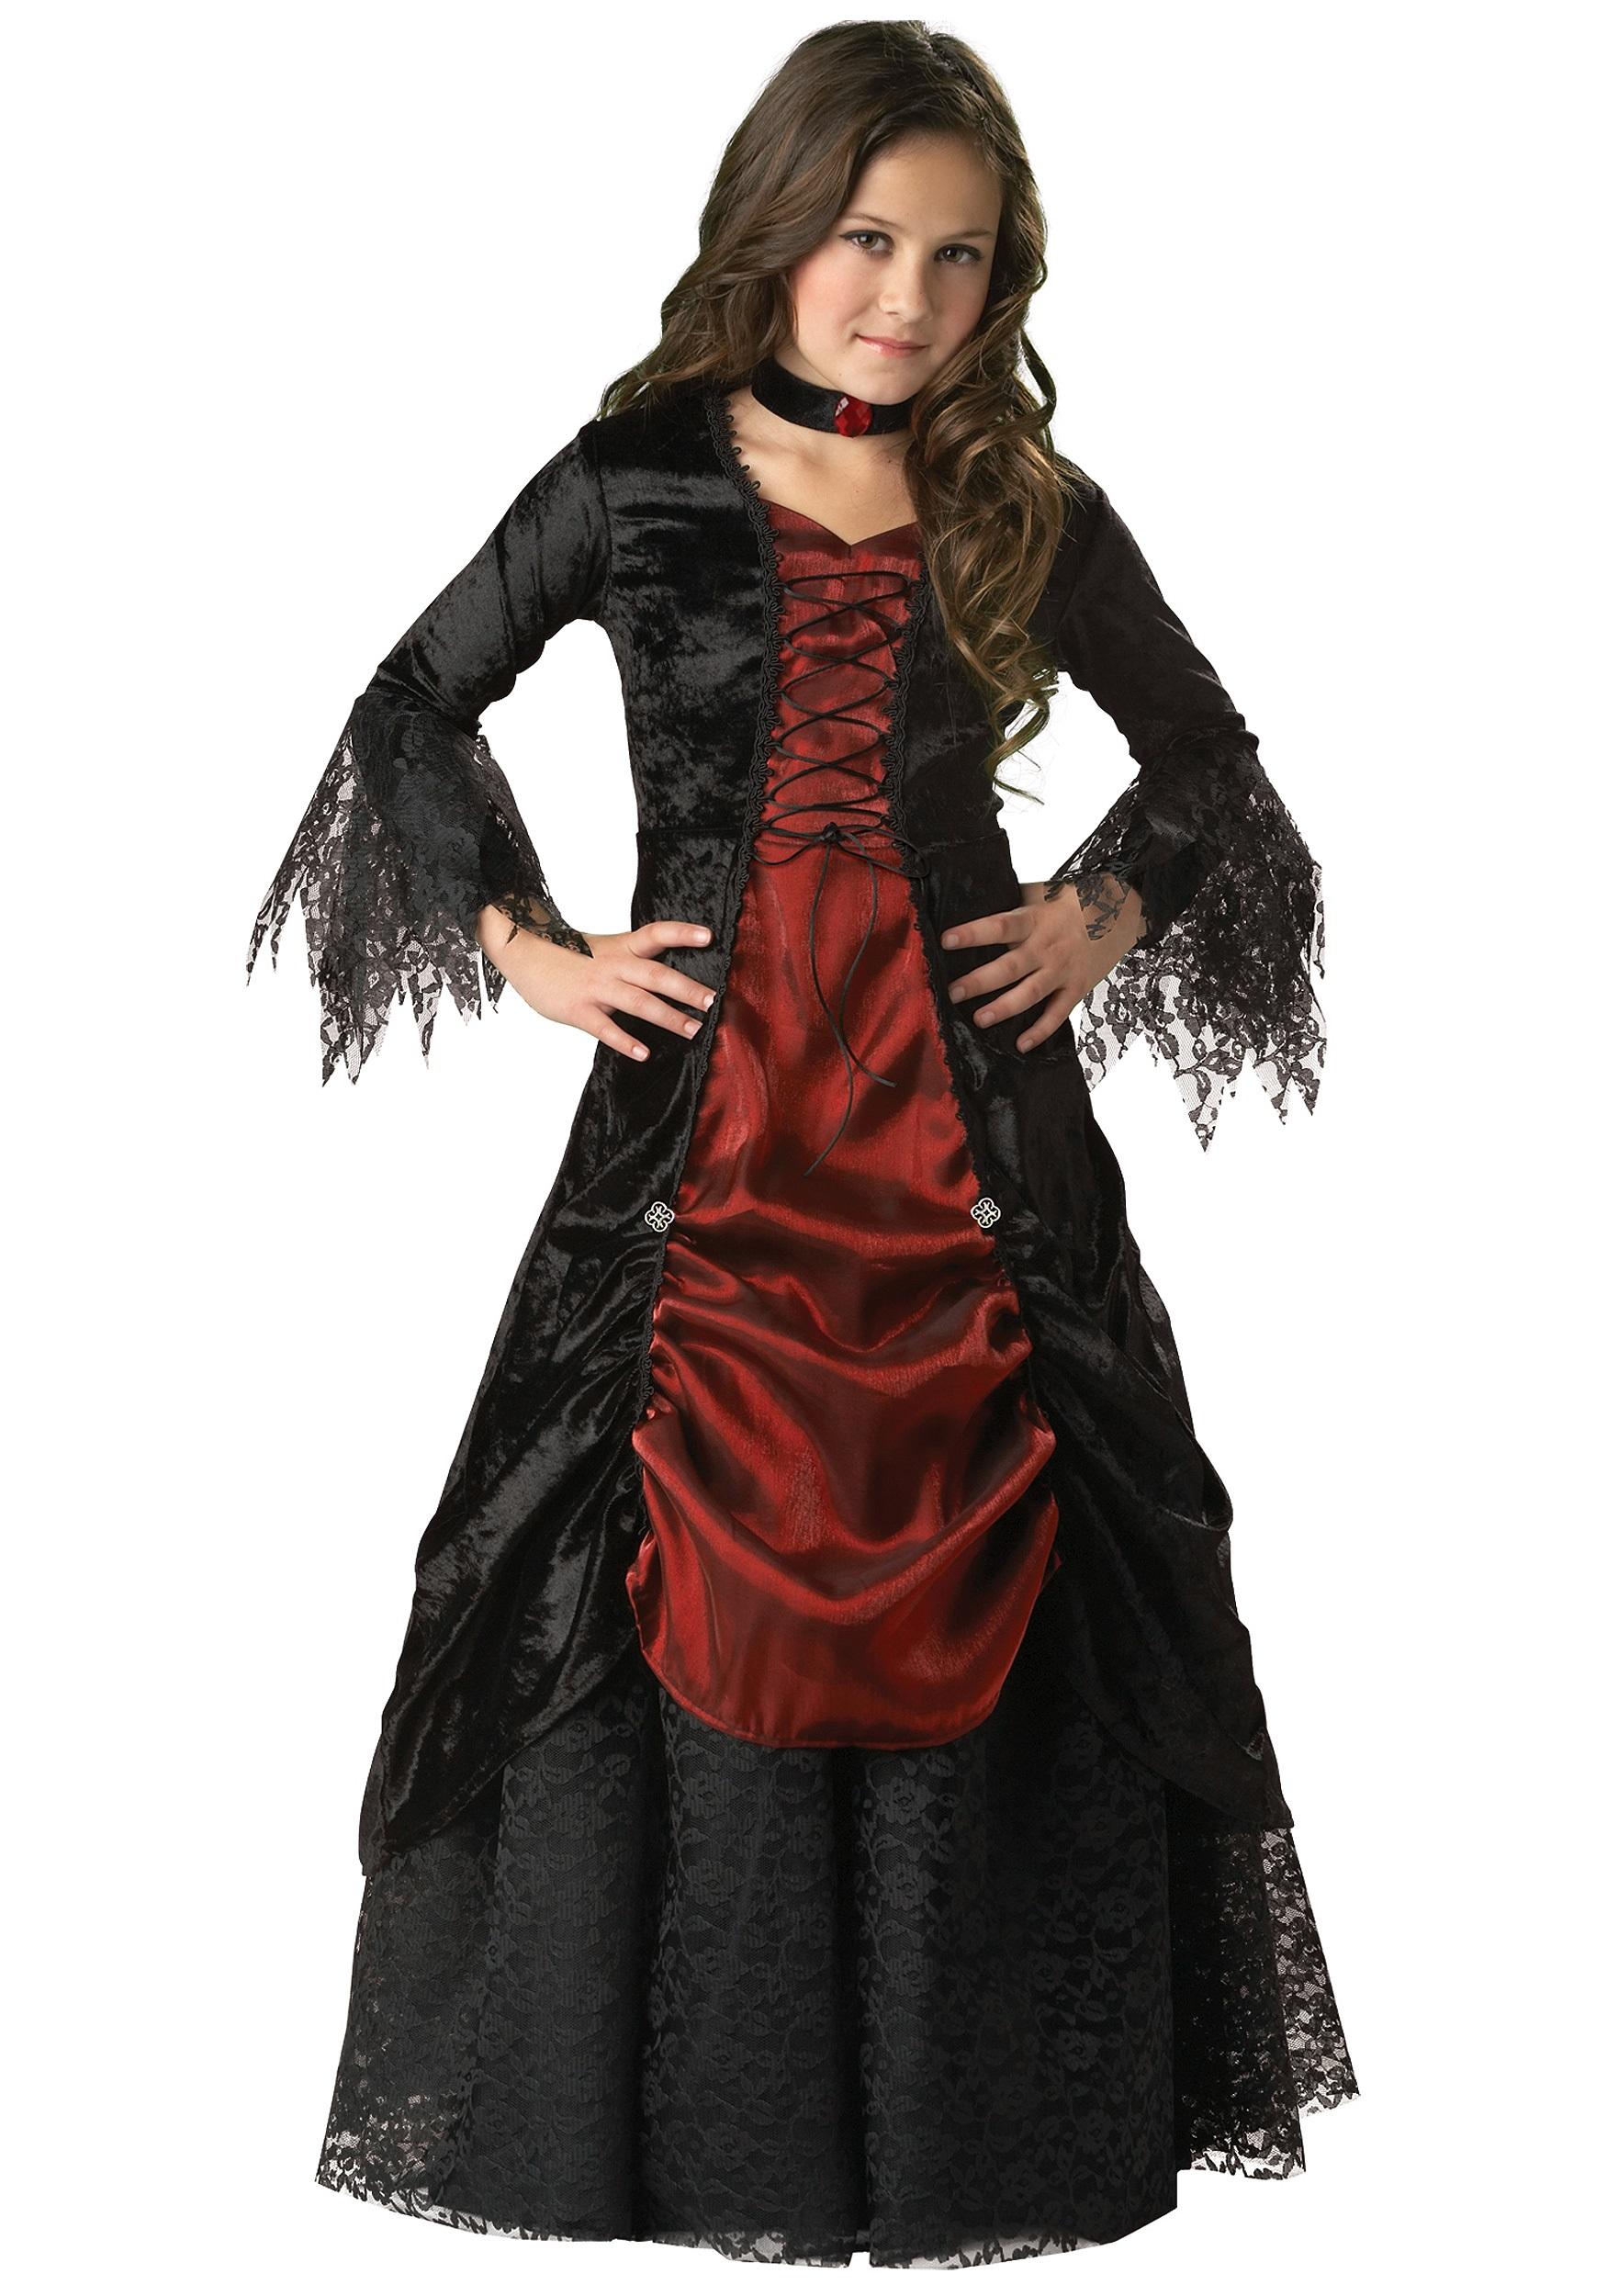 girls gothic vampira costume. Black Bedroom Furniture Sets. Home Design Ideas